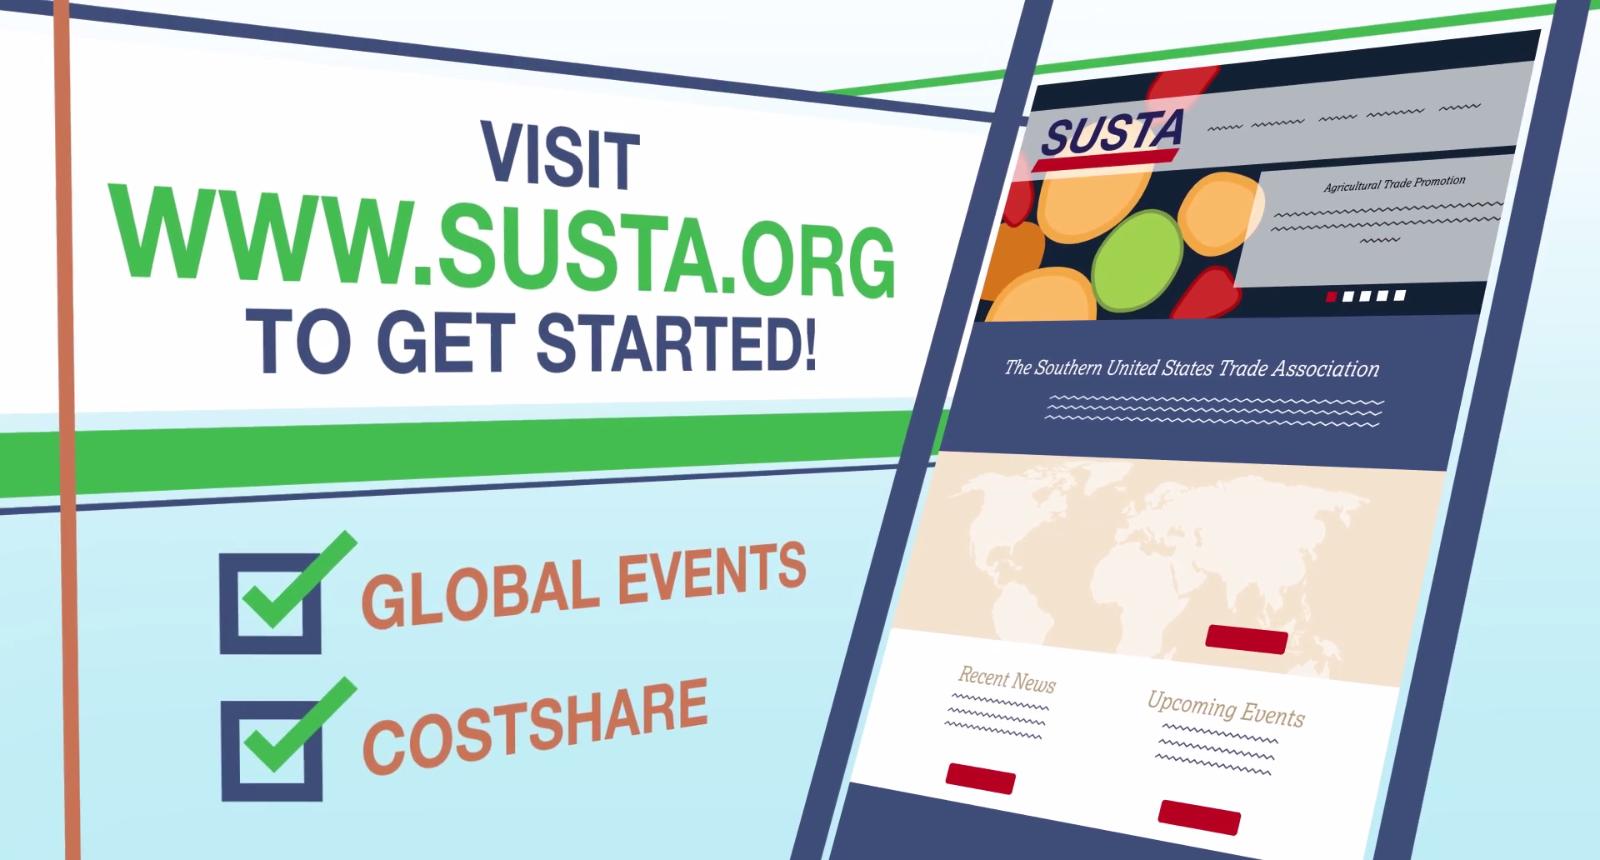 Southern United States Trade Association (SUSTA)